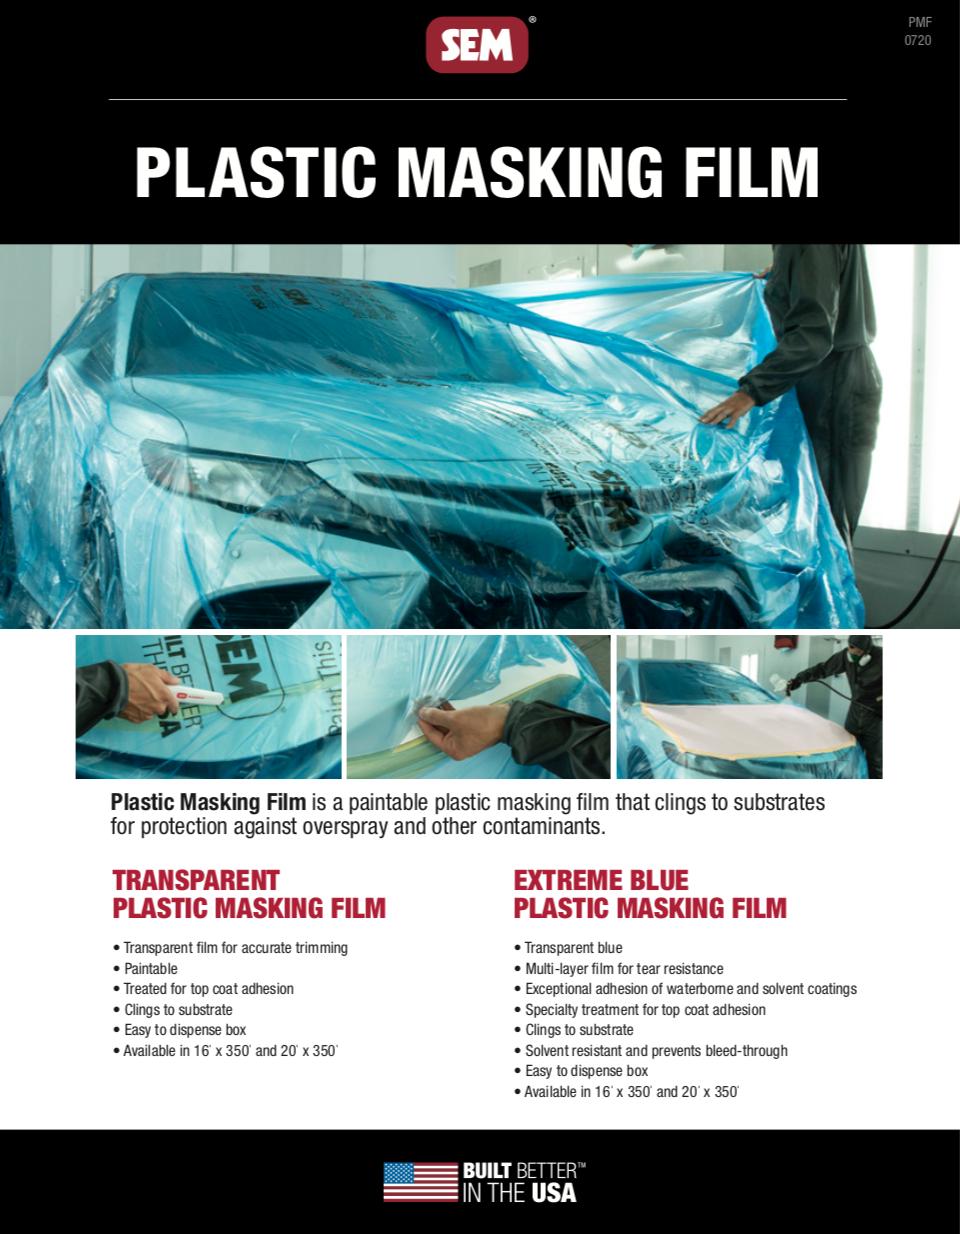 SEM Plastic Masking Film